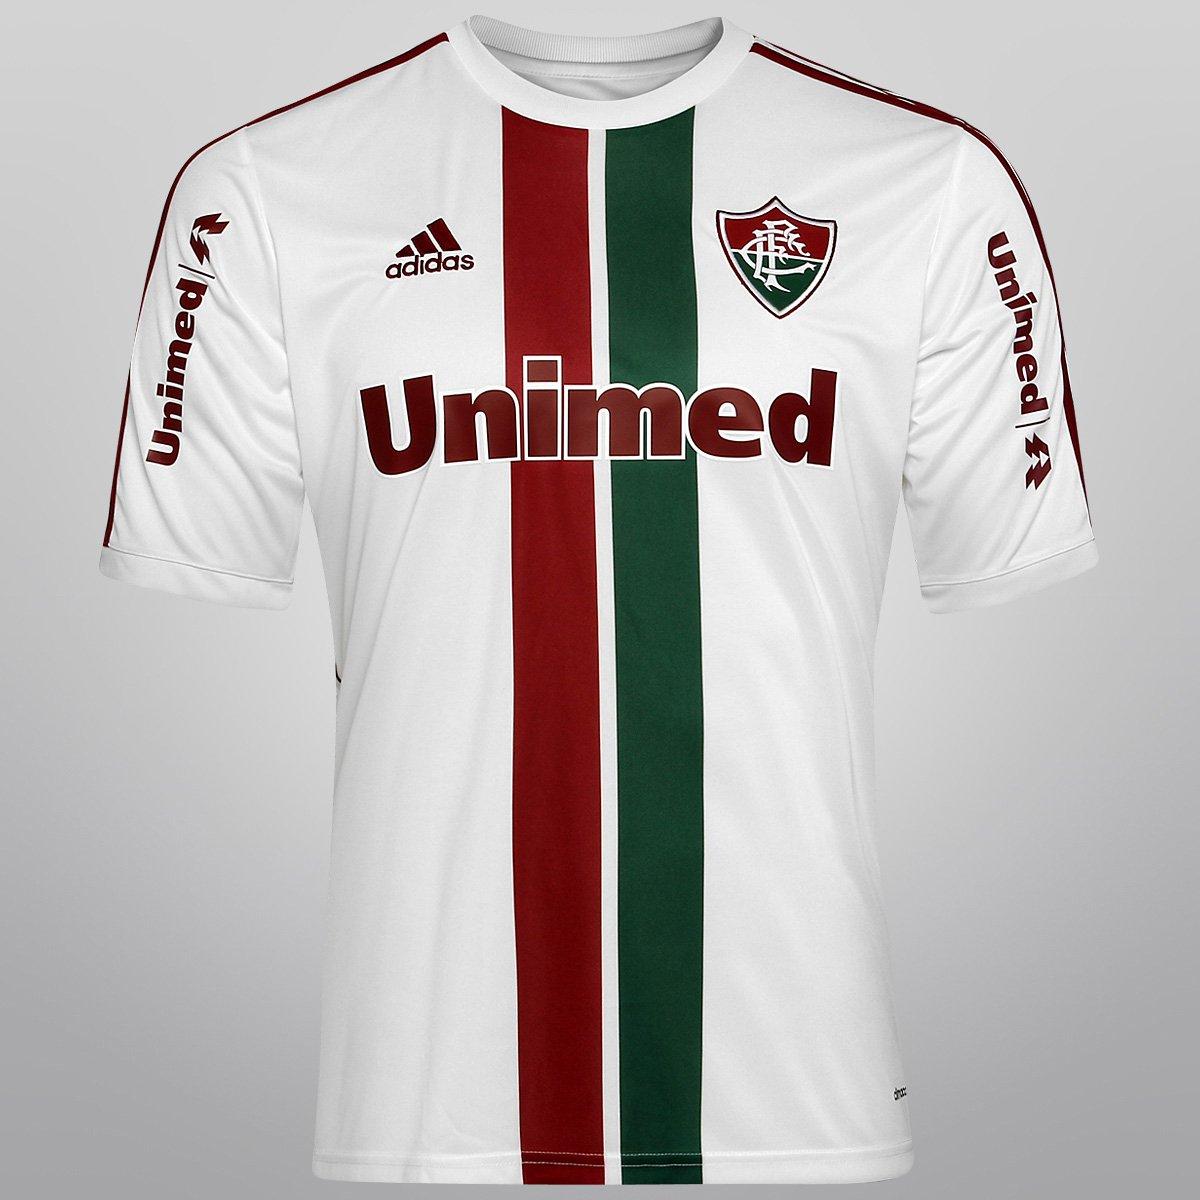 Camisa Fluminense II 14 15 s nº Torcedor Adidas Masculina - Compre Agora  ca35f5f4392ad